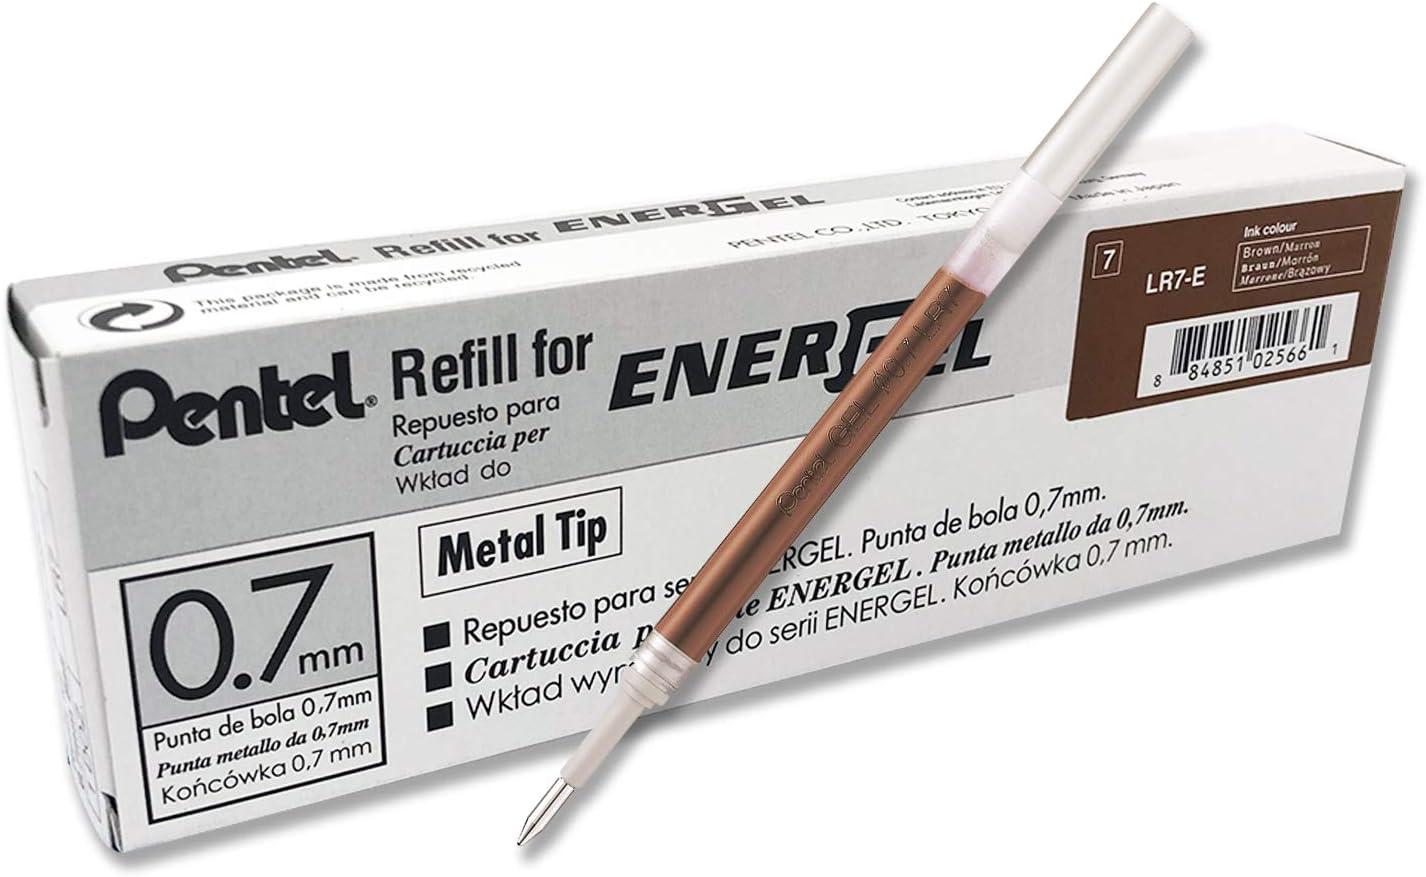 2 x FREE Amazon Metal Pens Parker Compatible Ink Pen RefillsPack of 20